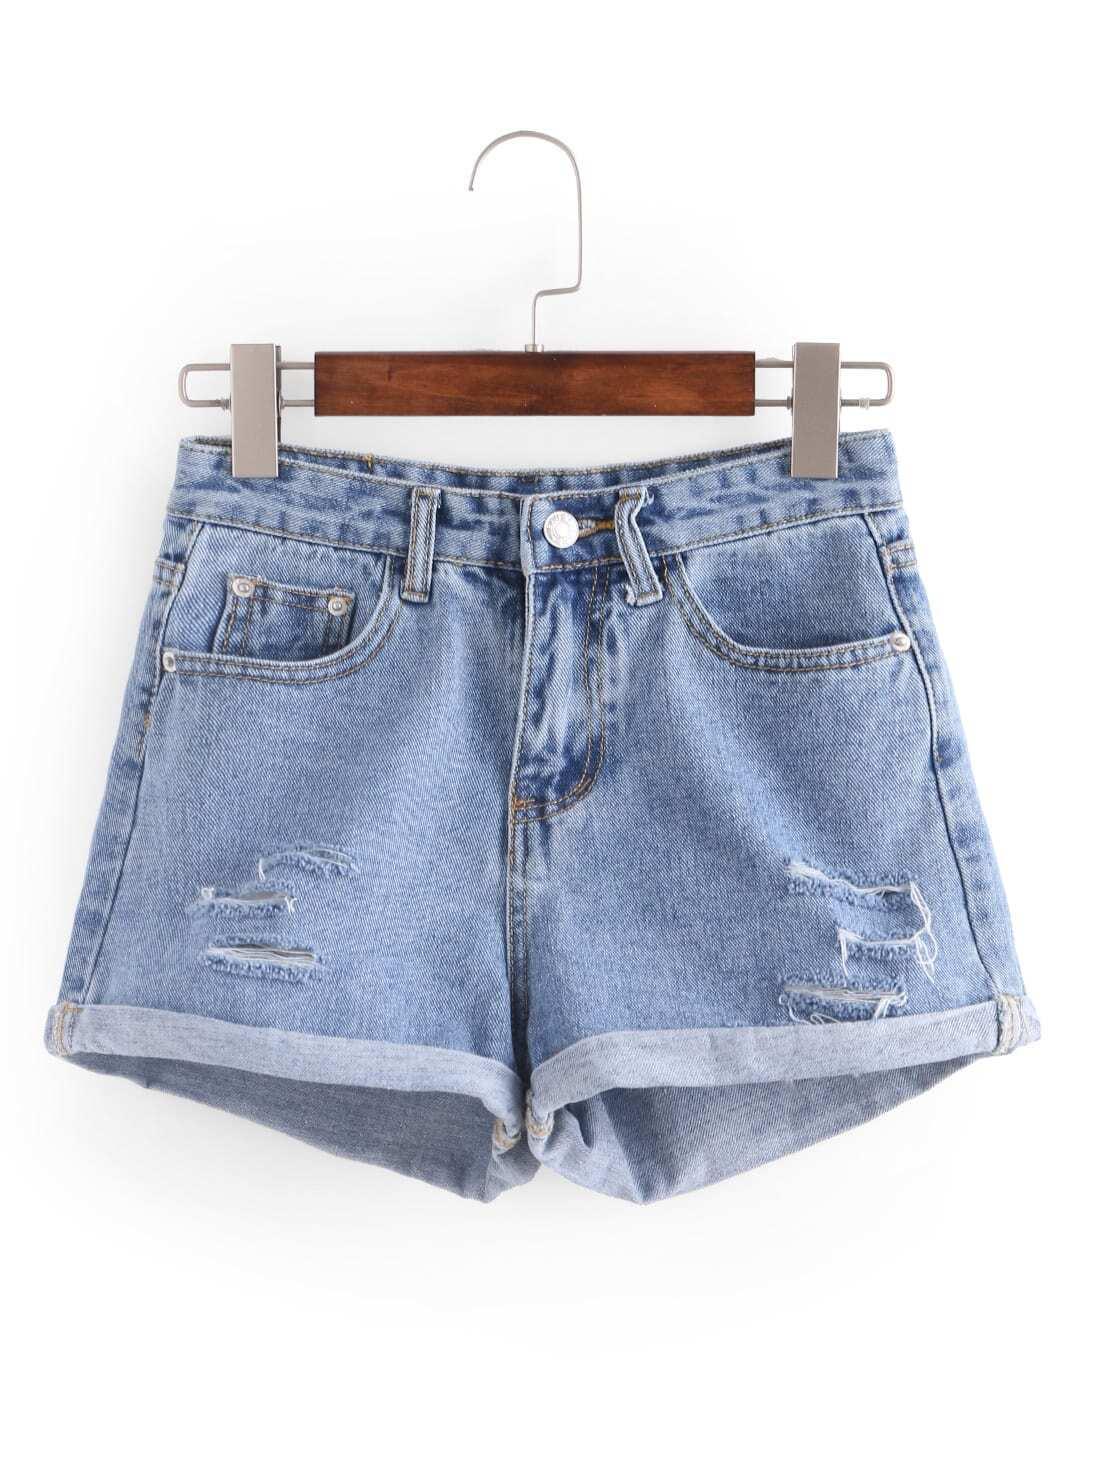 Ripped Rolled Hem Denim Shorts -SheIn(Sheinside)